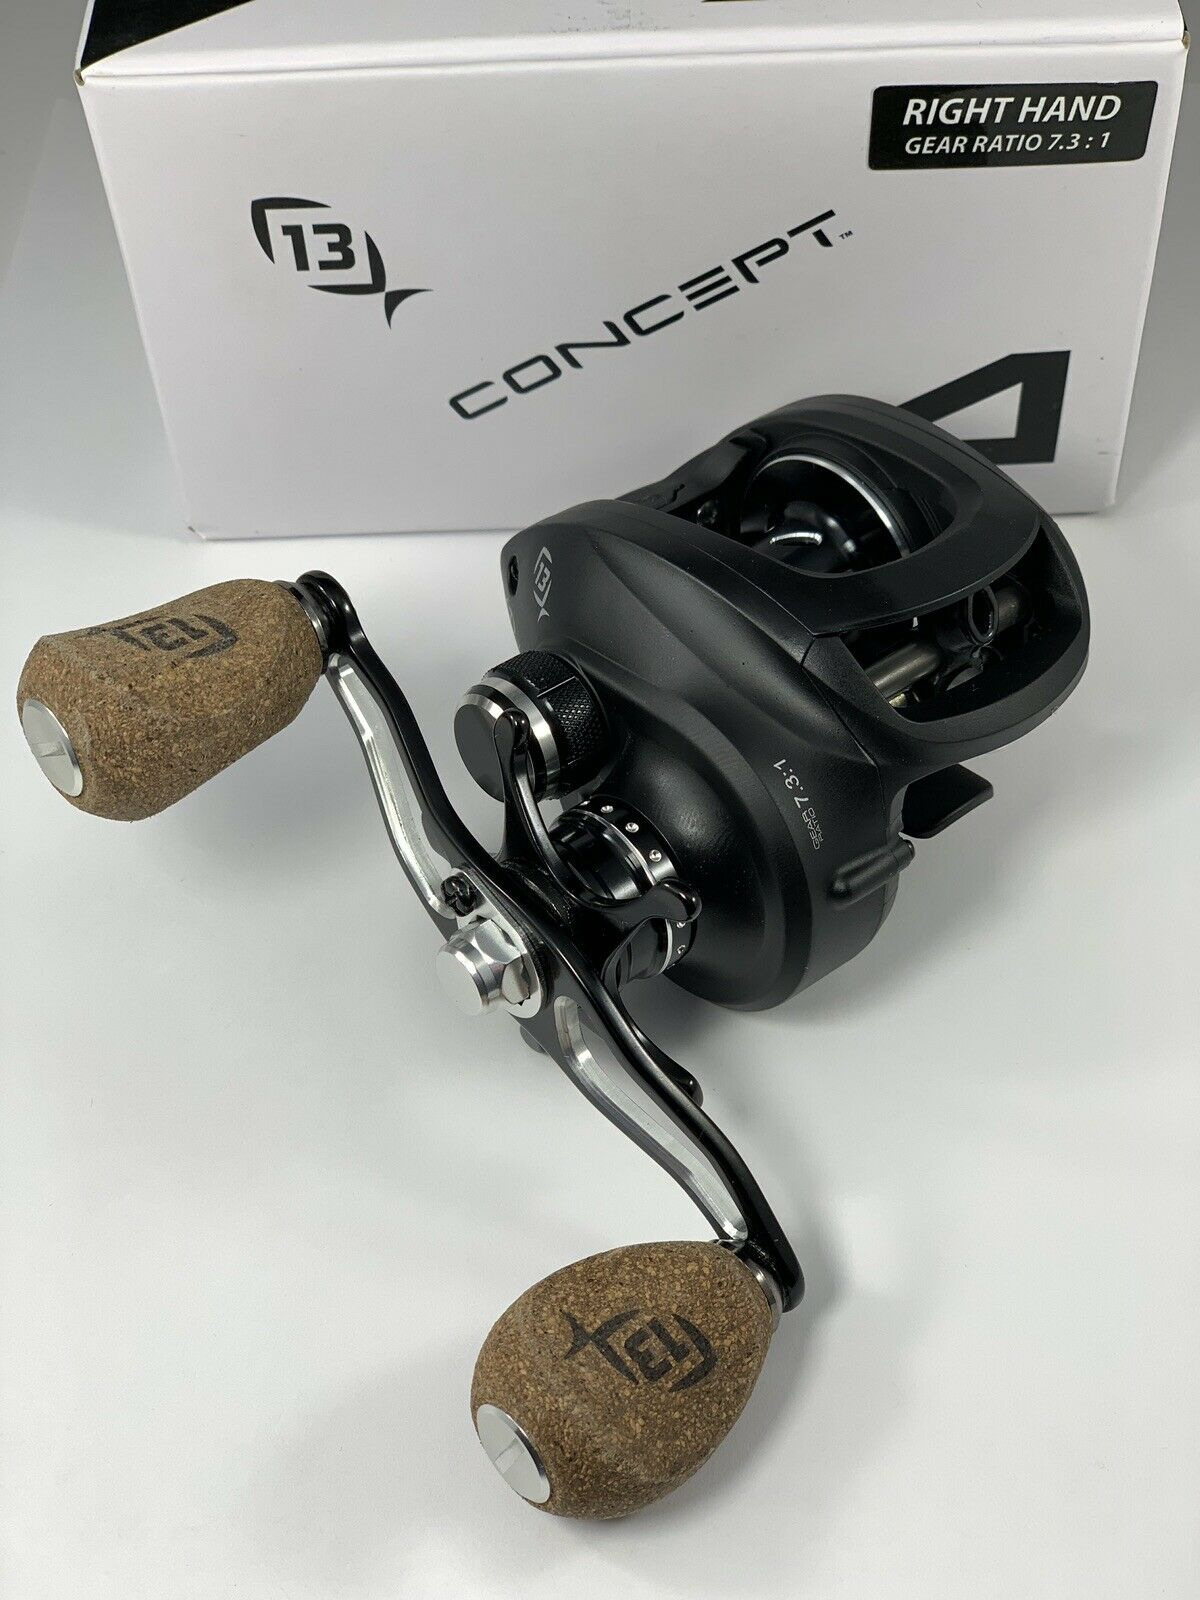 13 Fishing Concept A Reel - RH 7.3 1